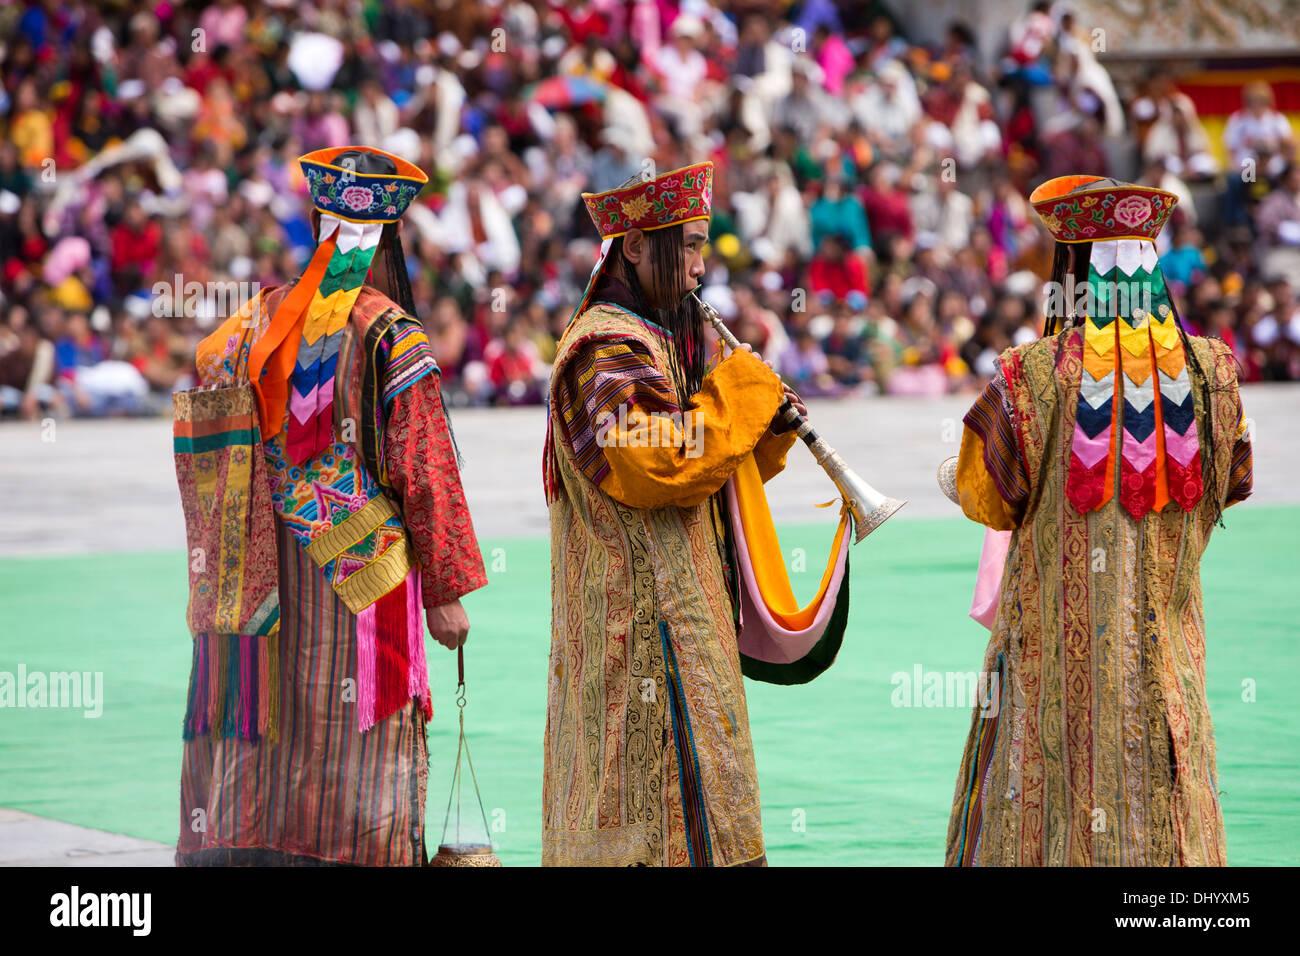 Le Bhoutan, Thimphu Tsechu annuel Dzong, moine, musiciens en tenue de cérémonie Photo Stock